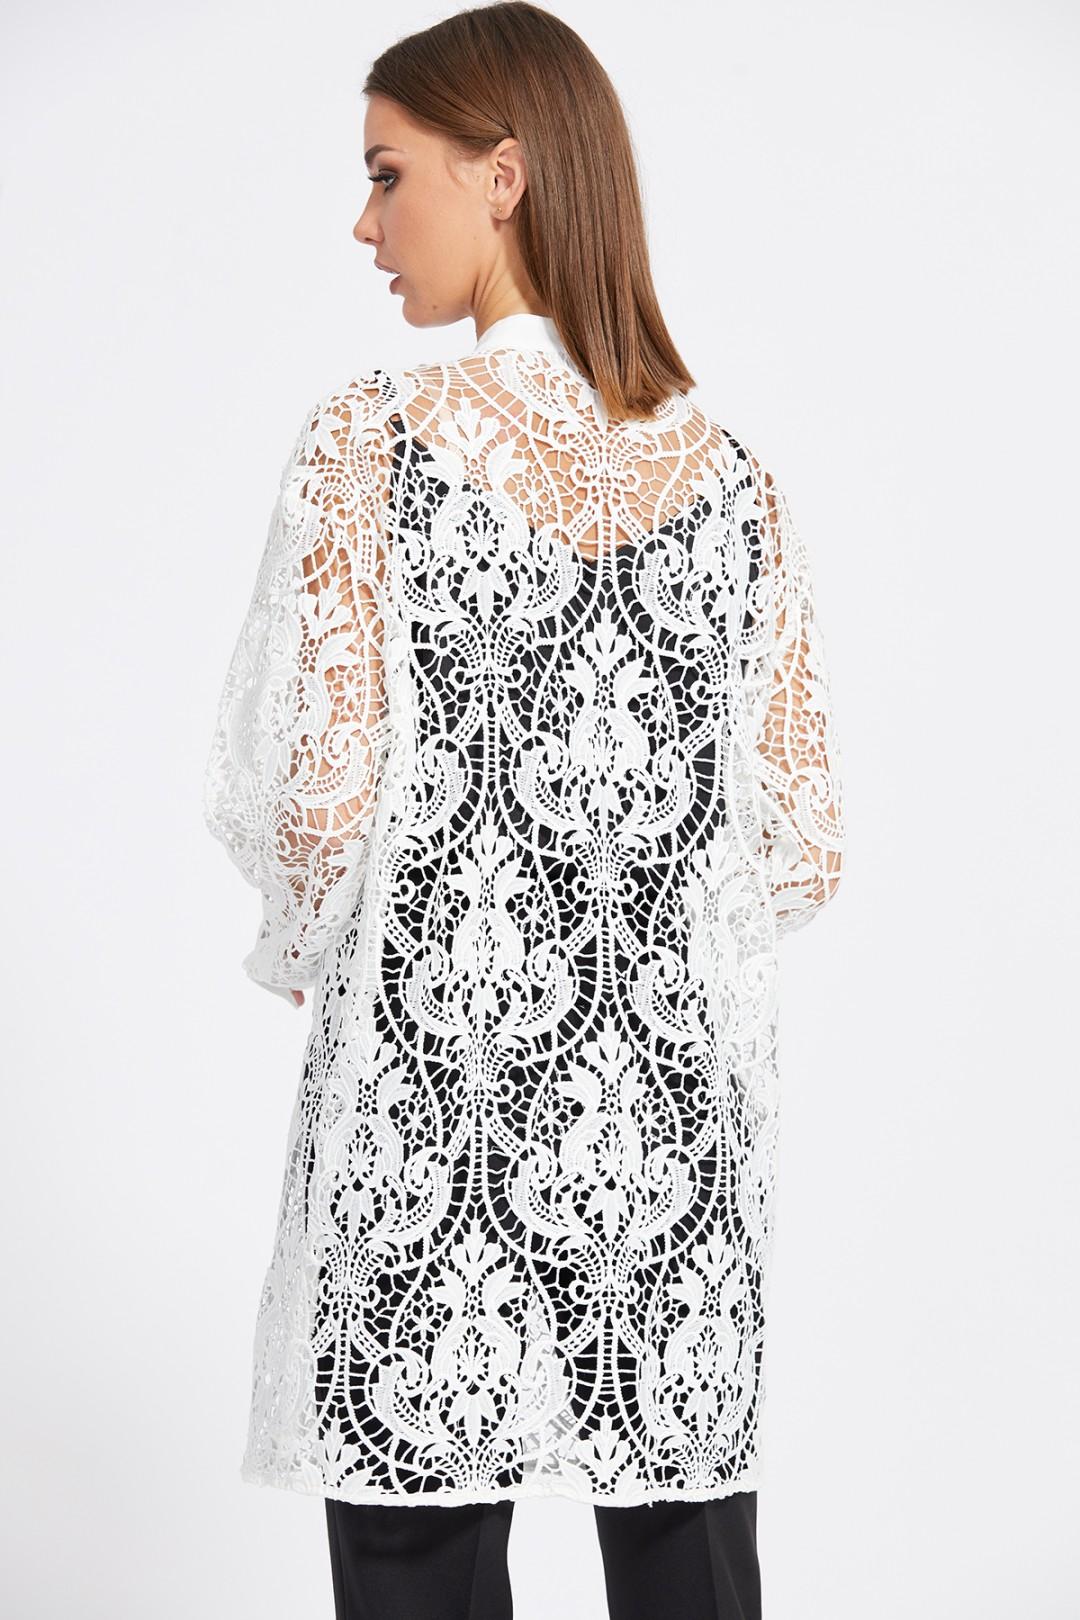 Блуза Эола Стиль 2067 молочный